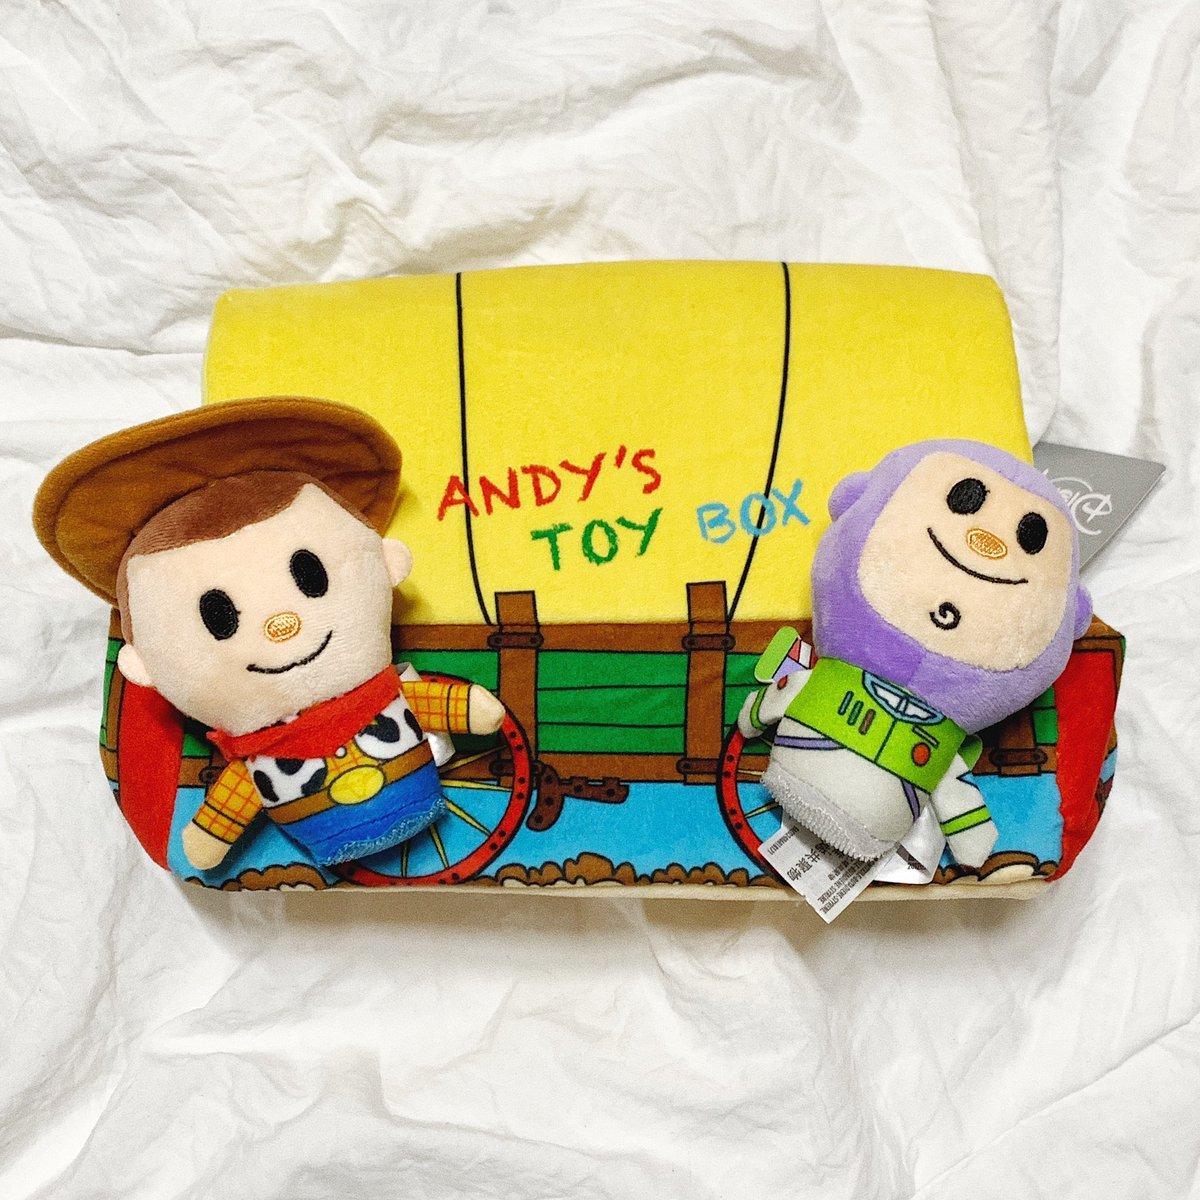 ᴡᴏᴏᴅʏ ᴀɴᴅ ʙᴜᴢᴢ🤎💜 = 하찮아서 귀여운 아이들  •_• 댕청댕청 #토이스토리 #디즈니 #픽사 #우디 #버즈 #우디와버즈 #앤디장난감상자 #토이스토리인형 #키덜트 #toystory #disney #pixar #woodyandbuzz #kidult #トイストーリー #ぬいぐるみ https://t.co/rFAr7XrGNN